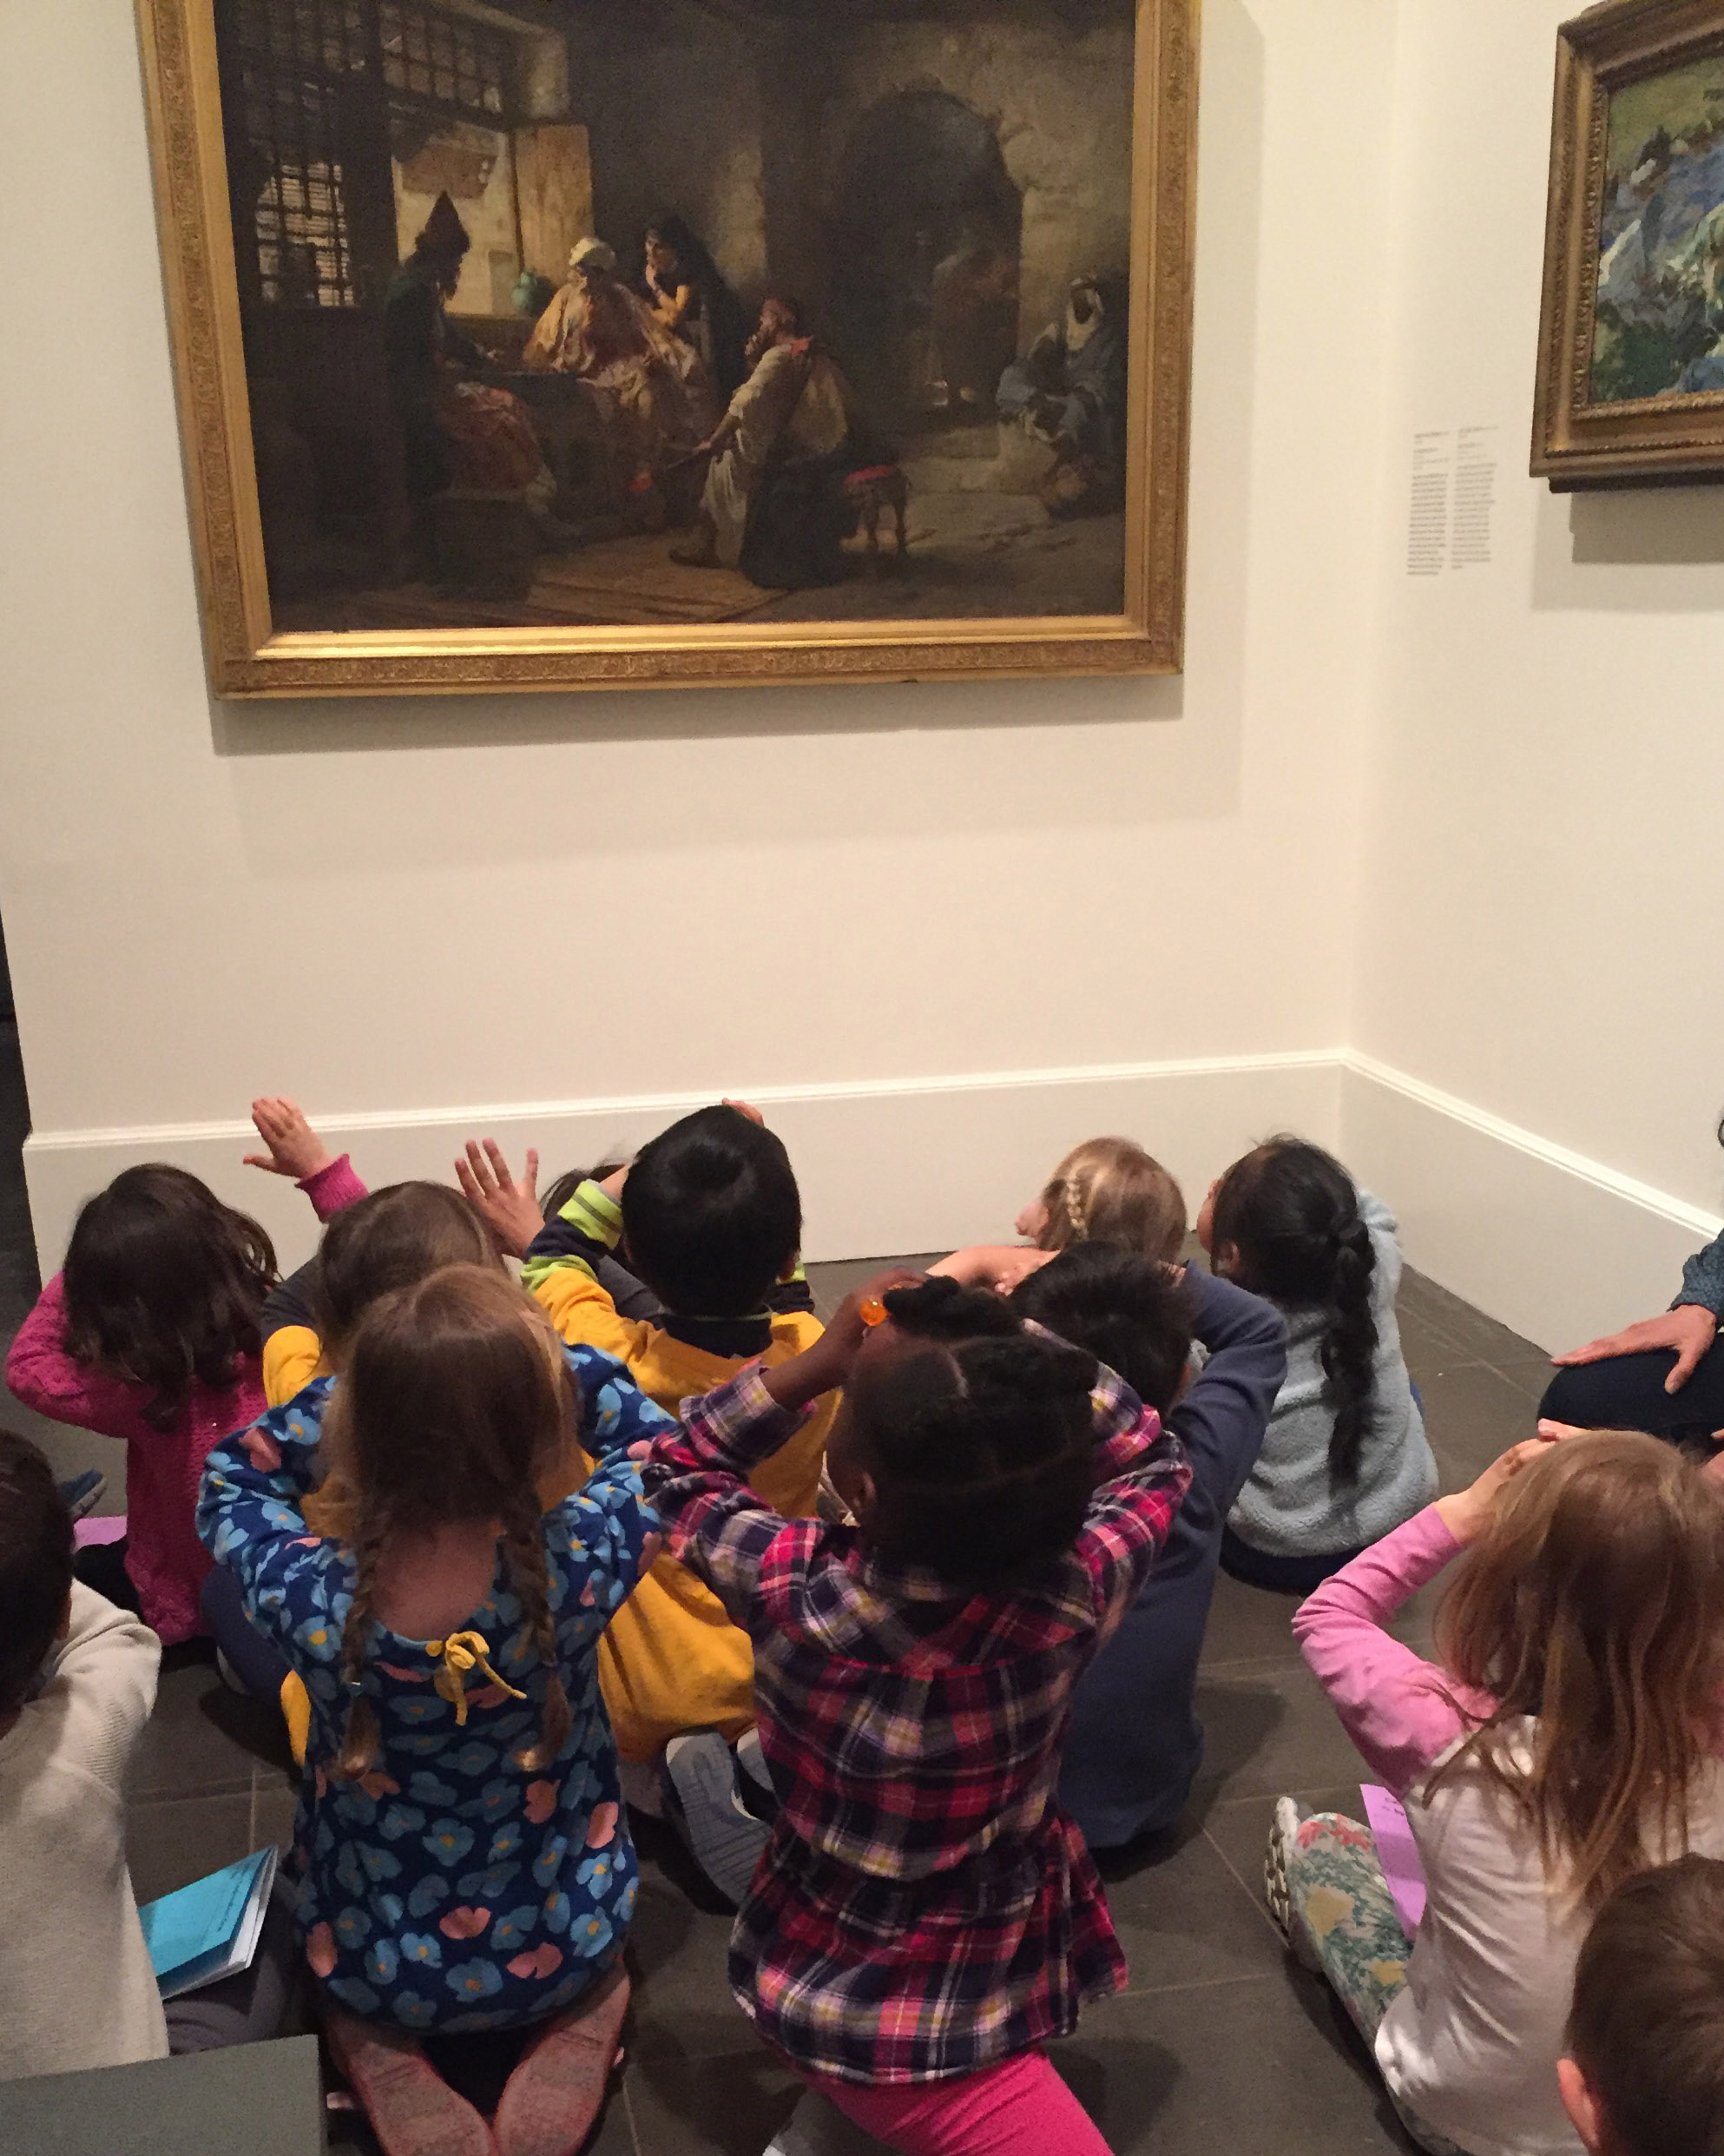 Figure 1: Kindergarten students examine an artwork atthe Brooklyn Museum.